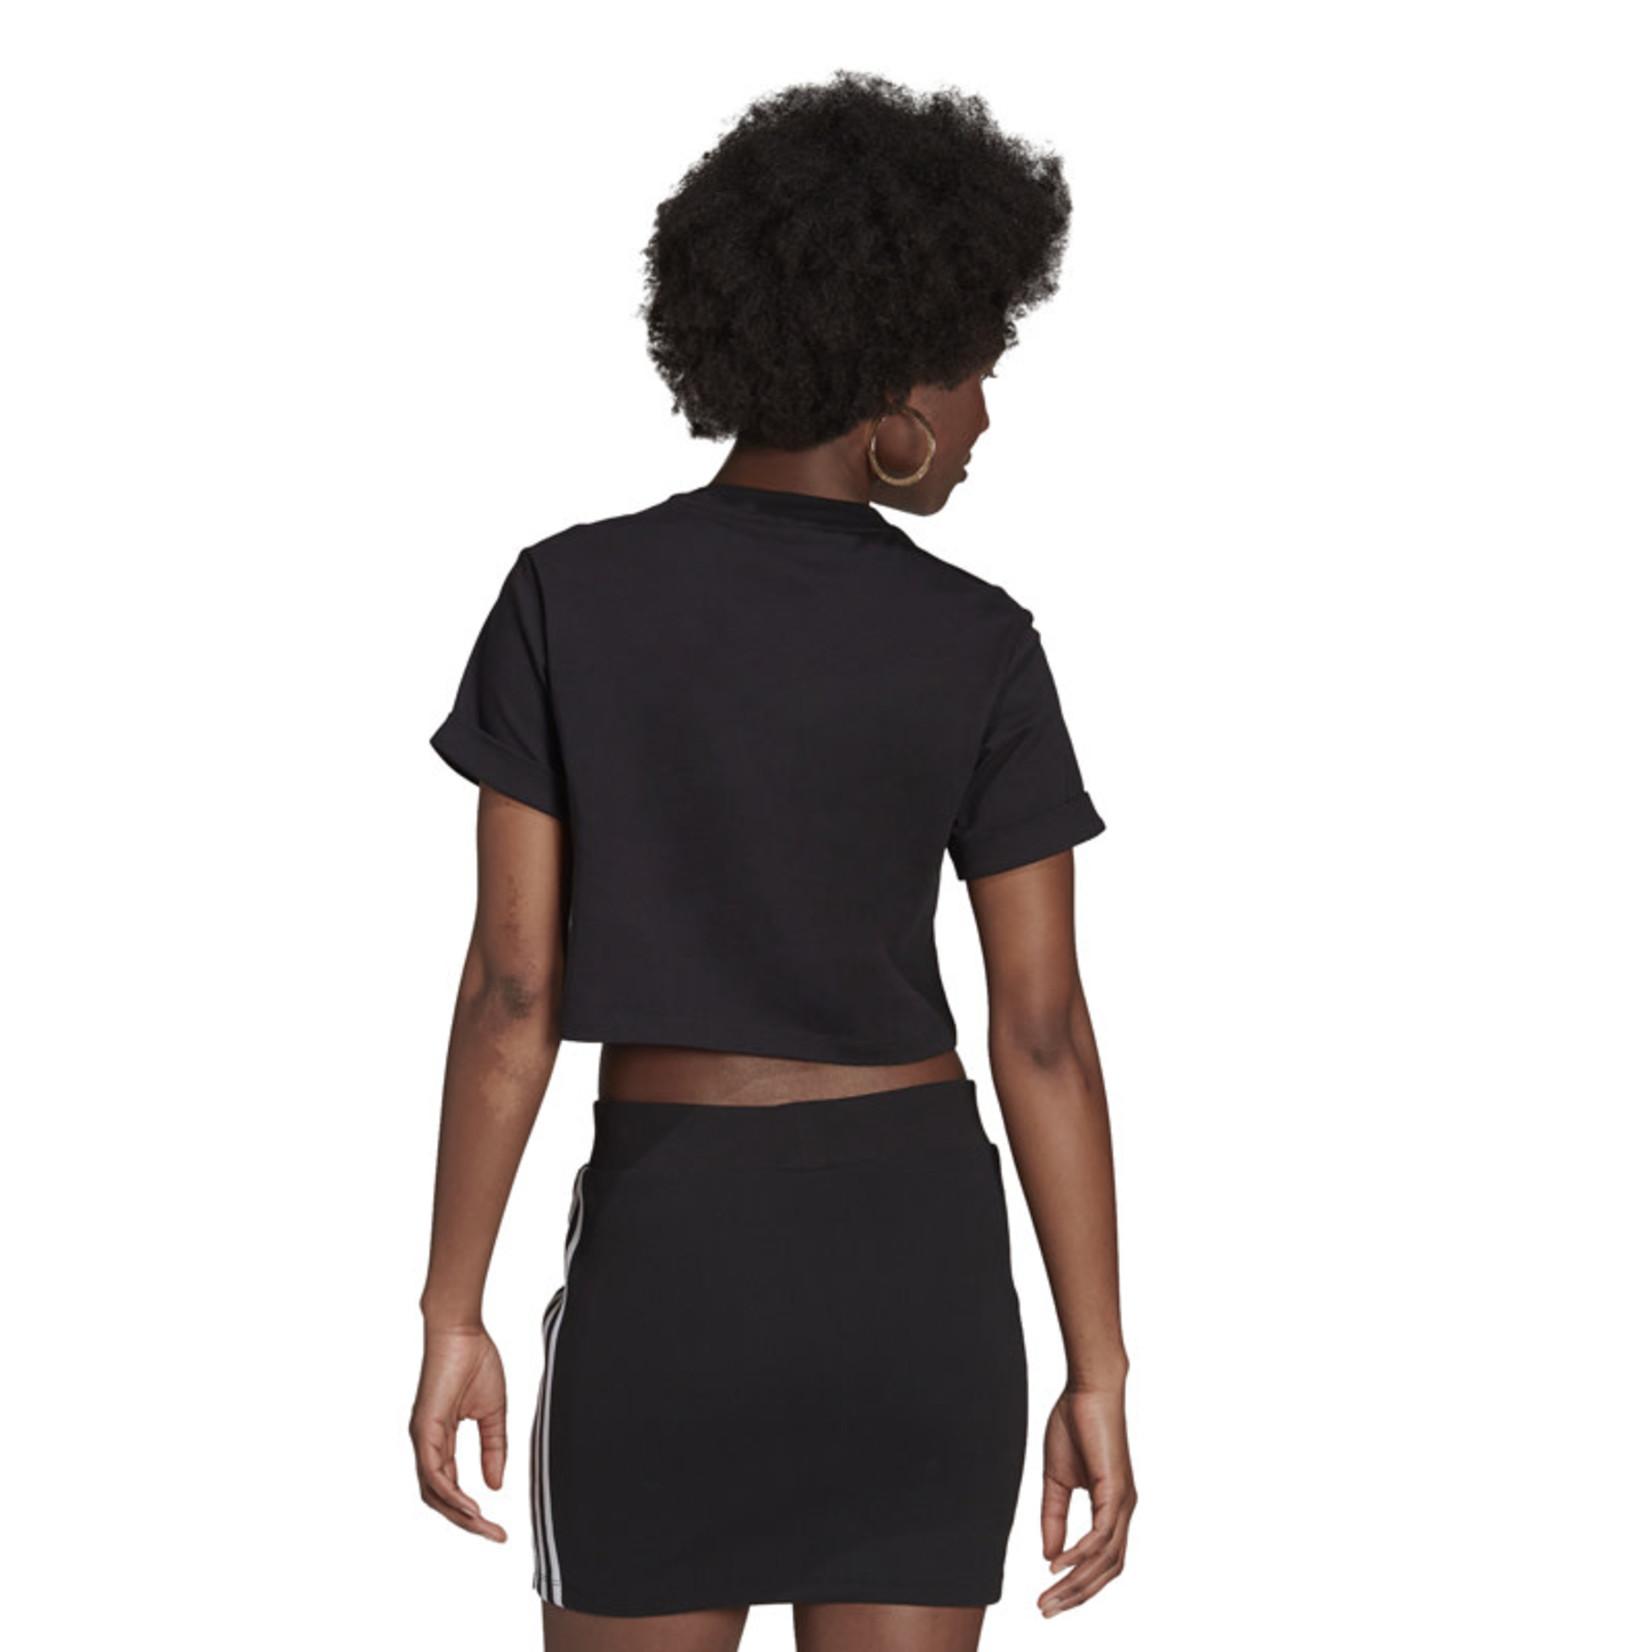 Adidas Adidas : Cropped Short Sleeve T-Shirt